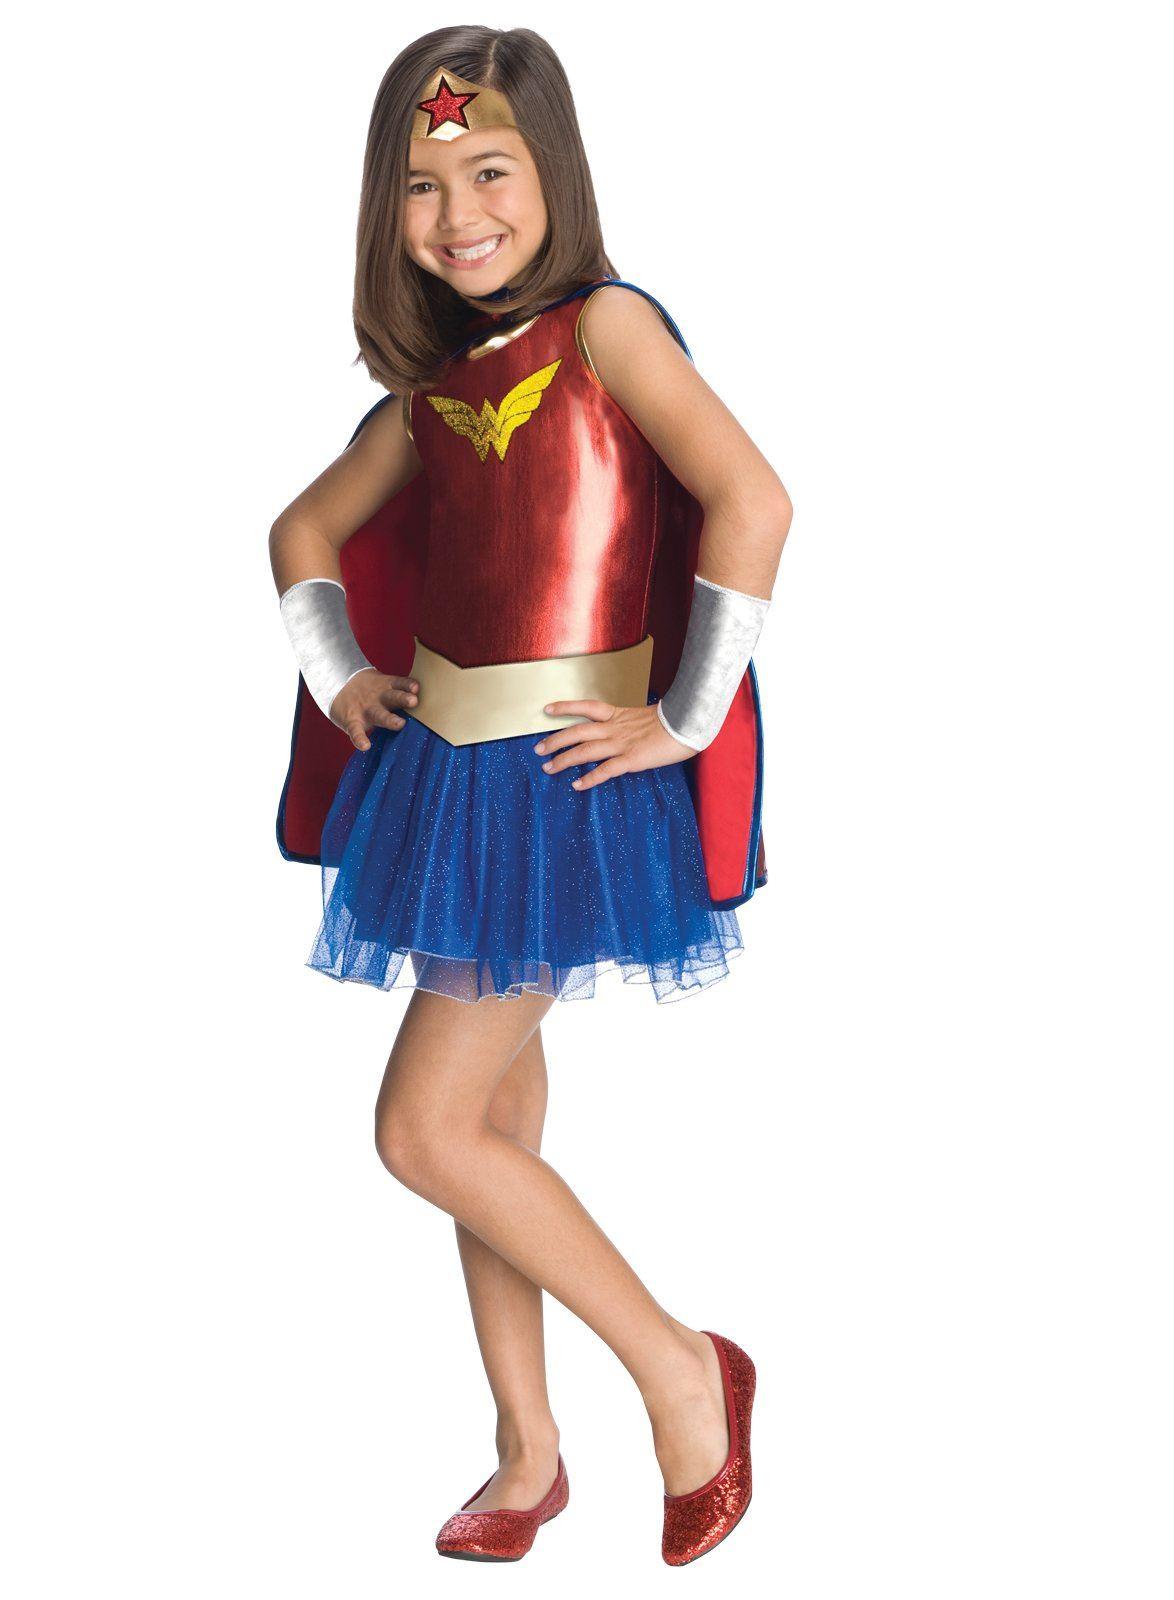 Kids Wonder Woman Girls Costume | $35.99 | The Costume Land